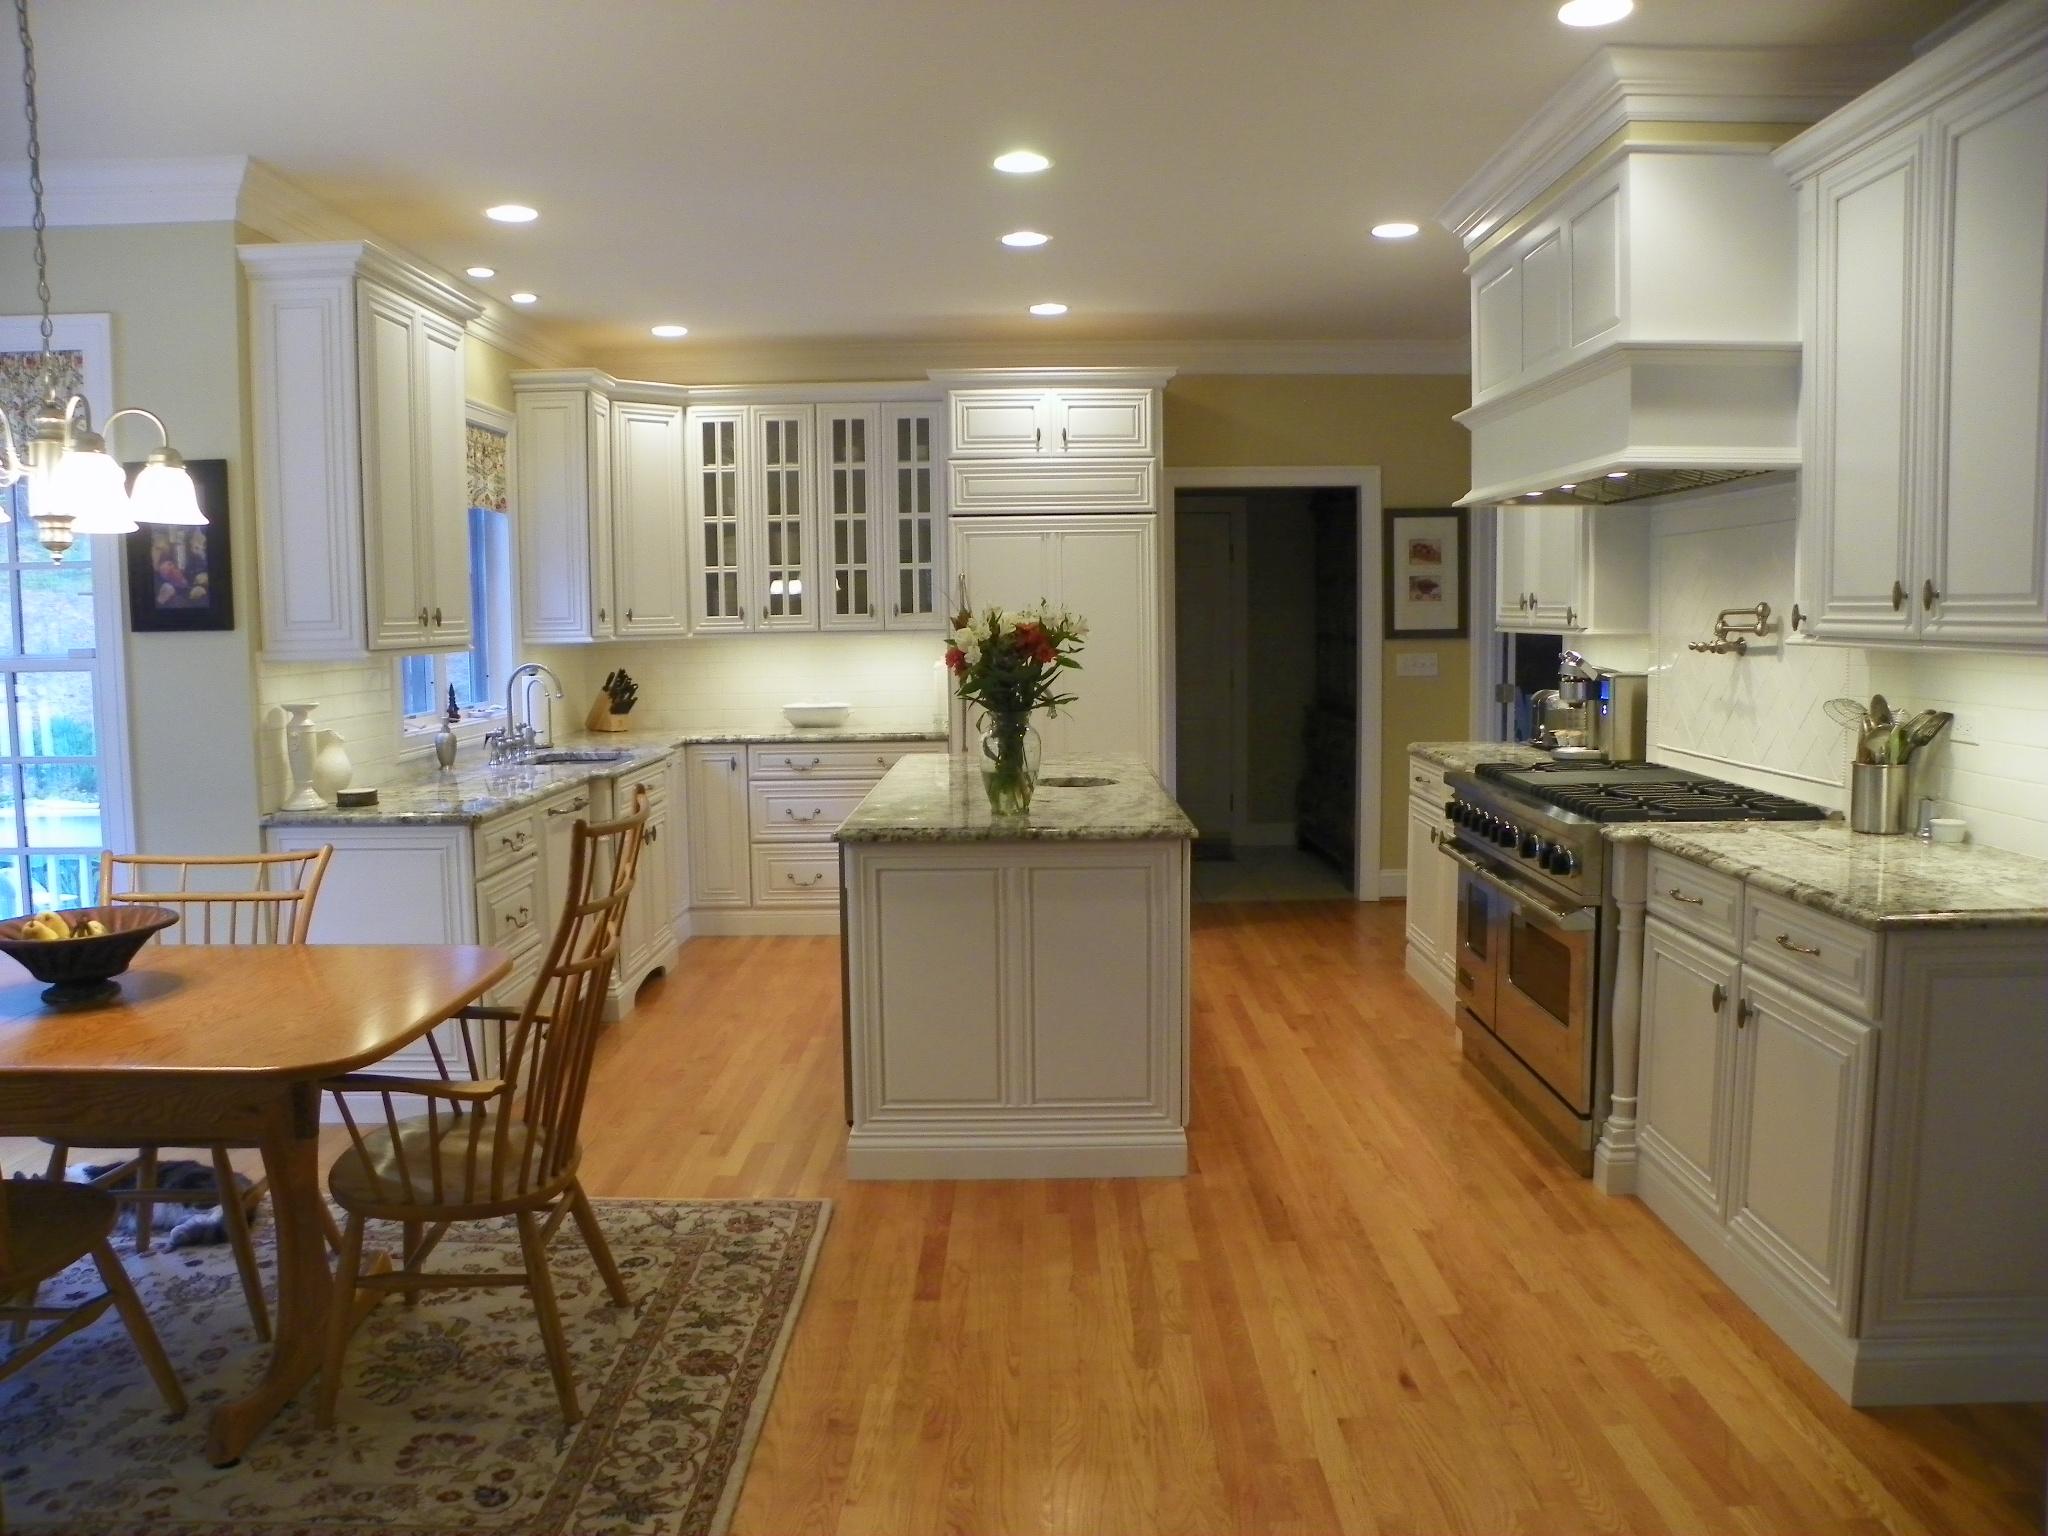 kitchen-remodel-07.jpg